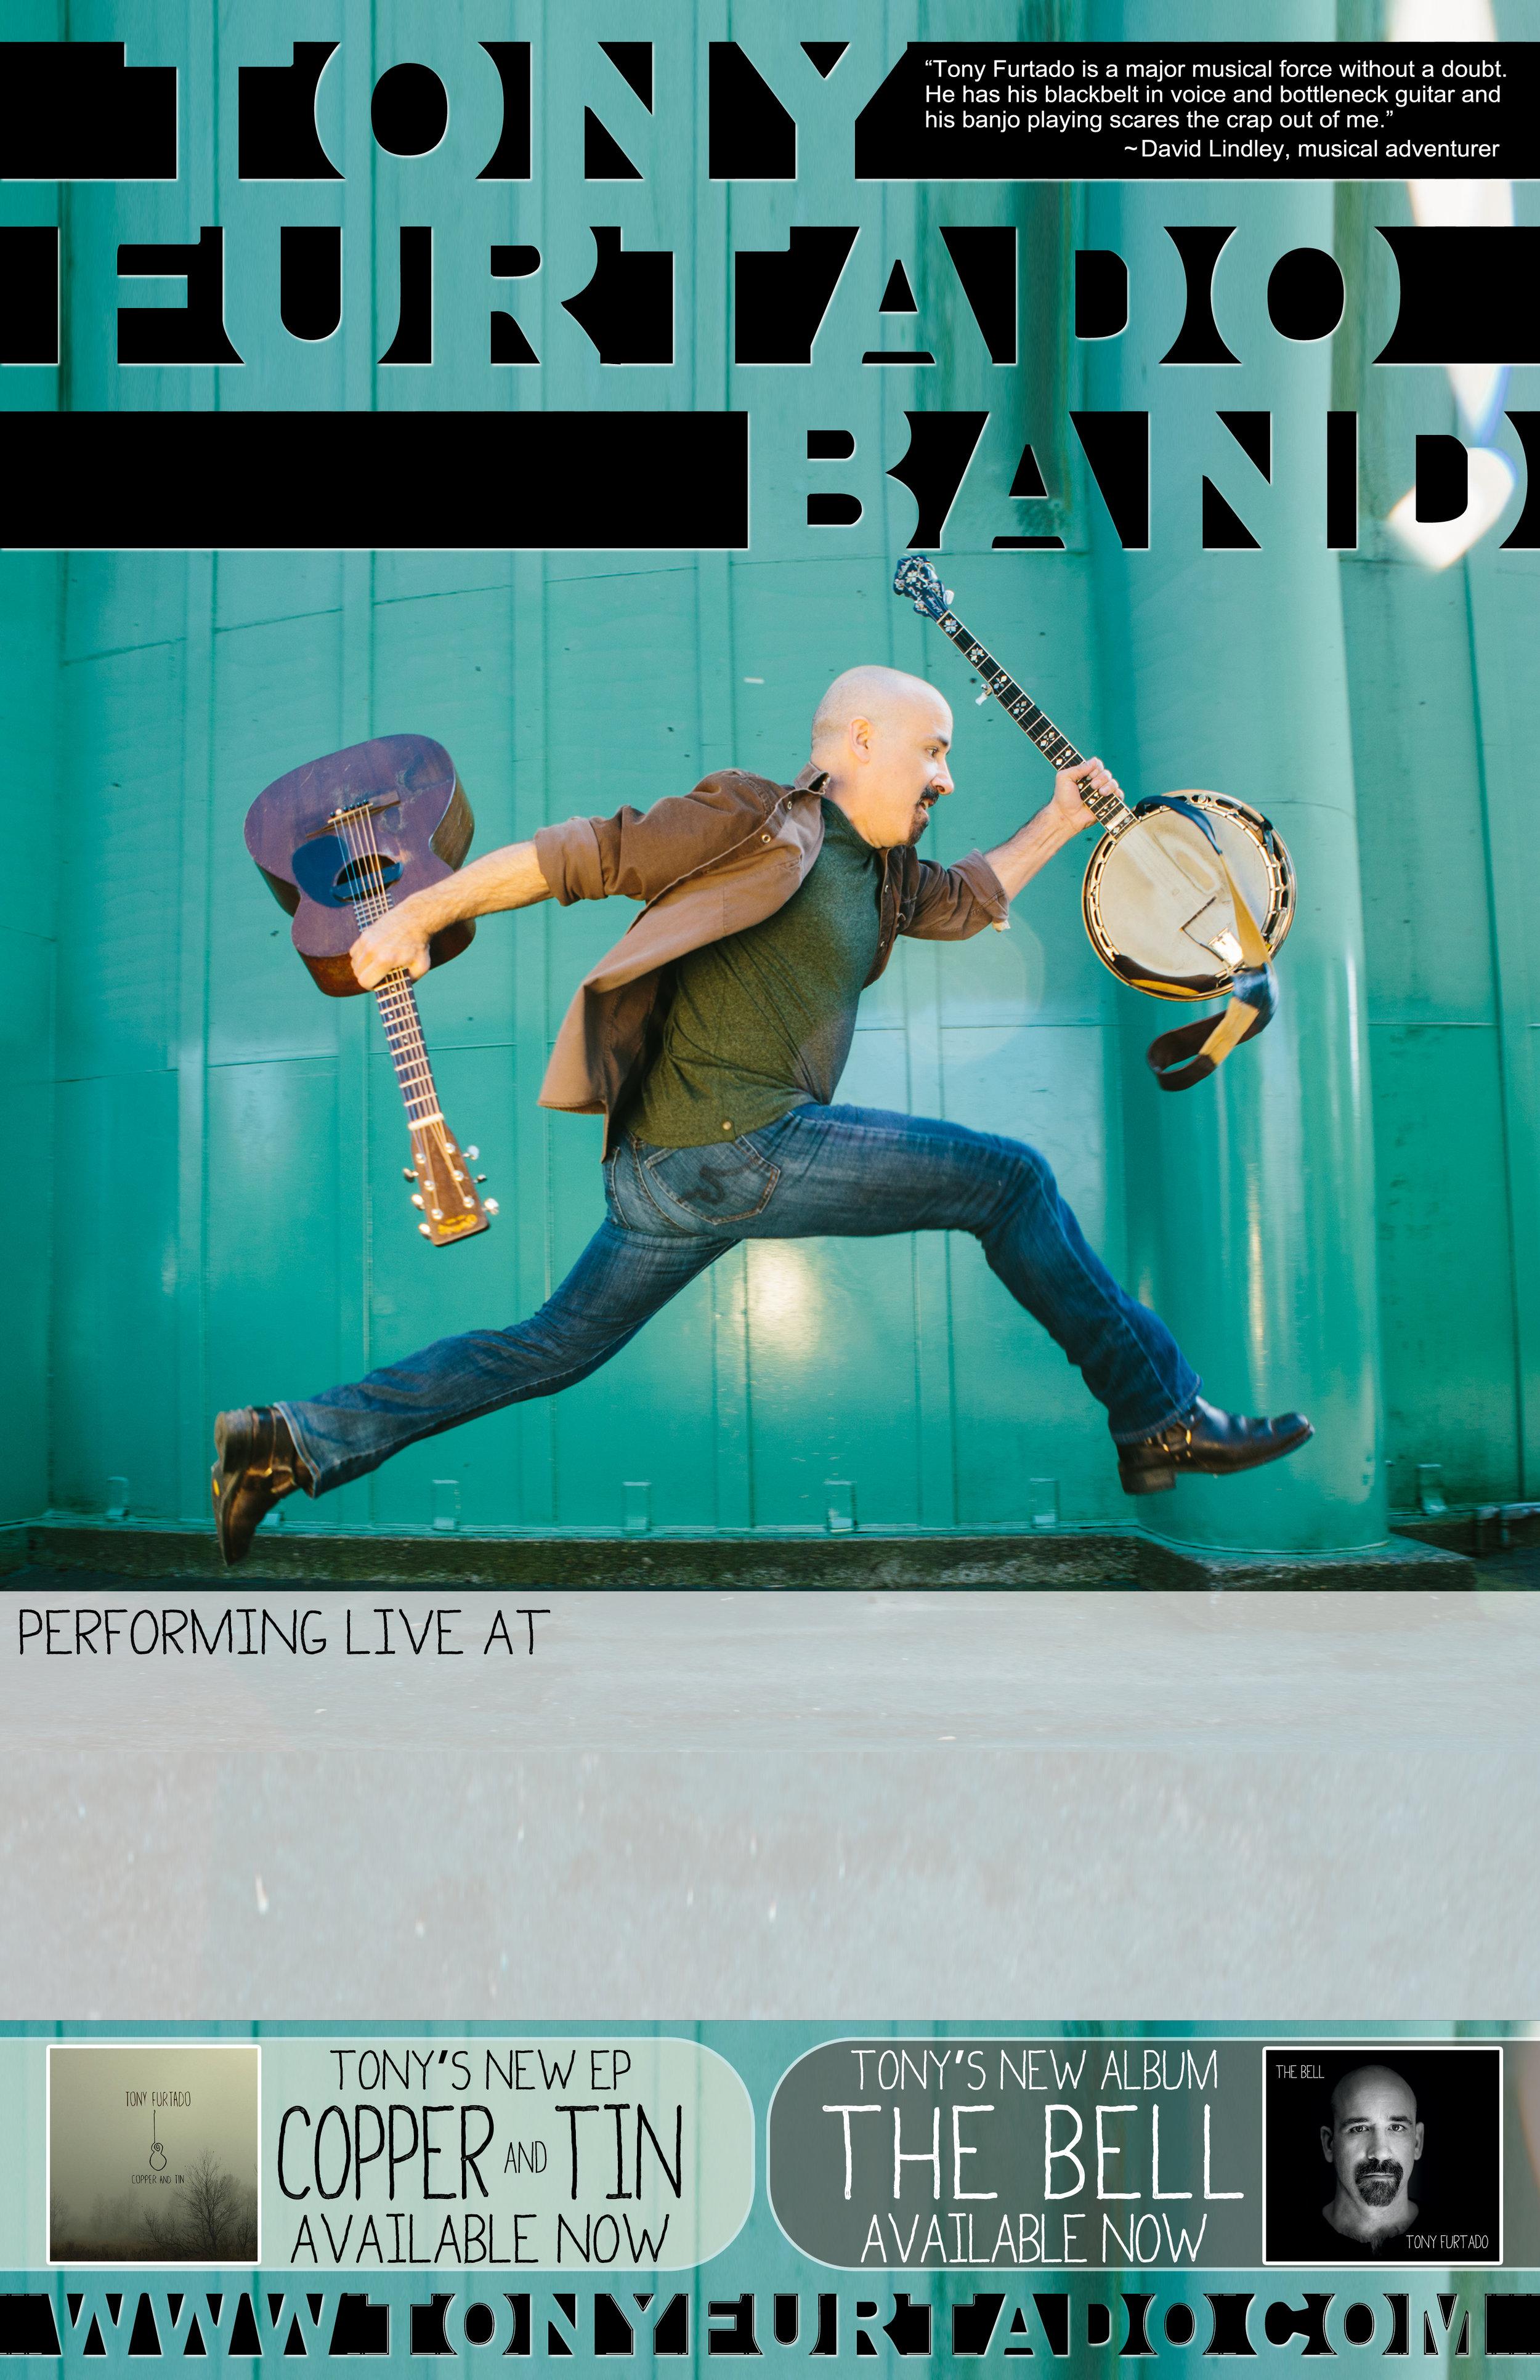 Tony Furtado BAND Poster